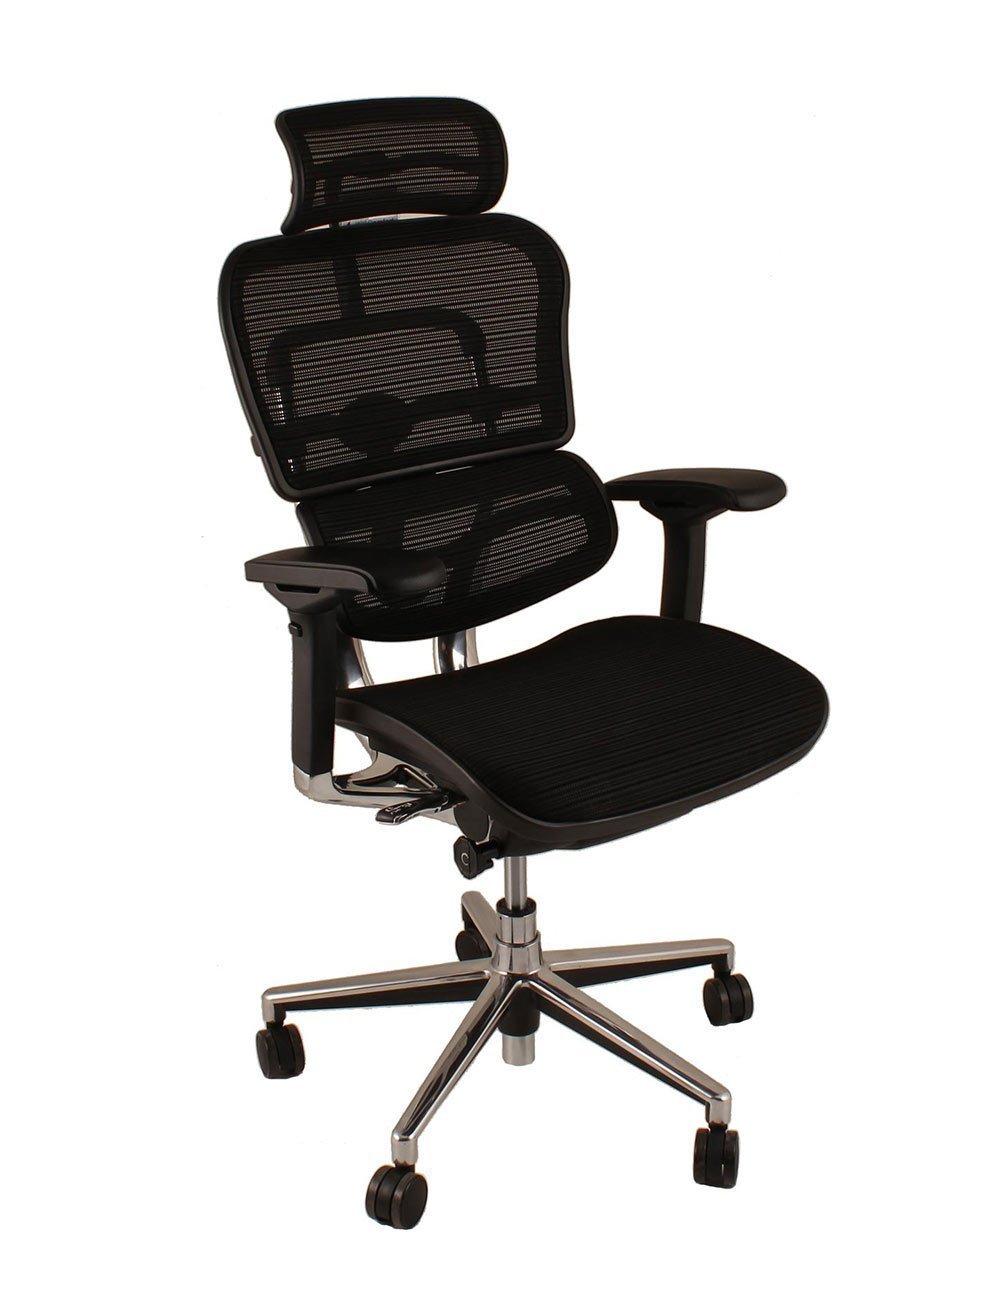 Pleasing The Ergohuman Plus Elite Chair Ibusinesslaw Wood Chair Design Ideas Ibusinesslaworg